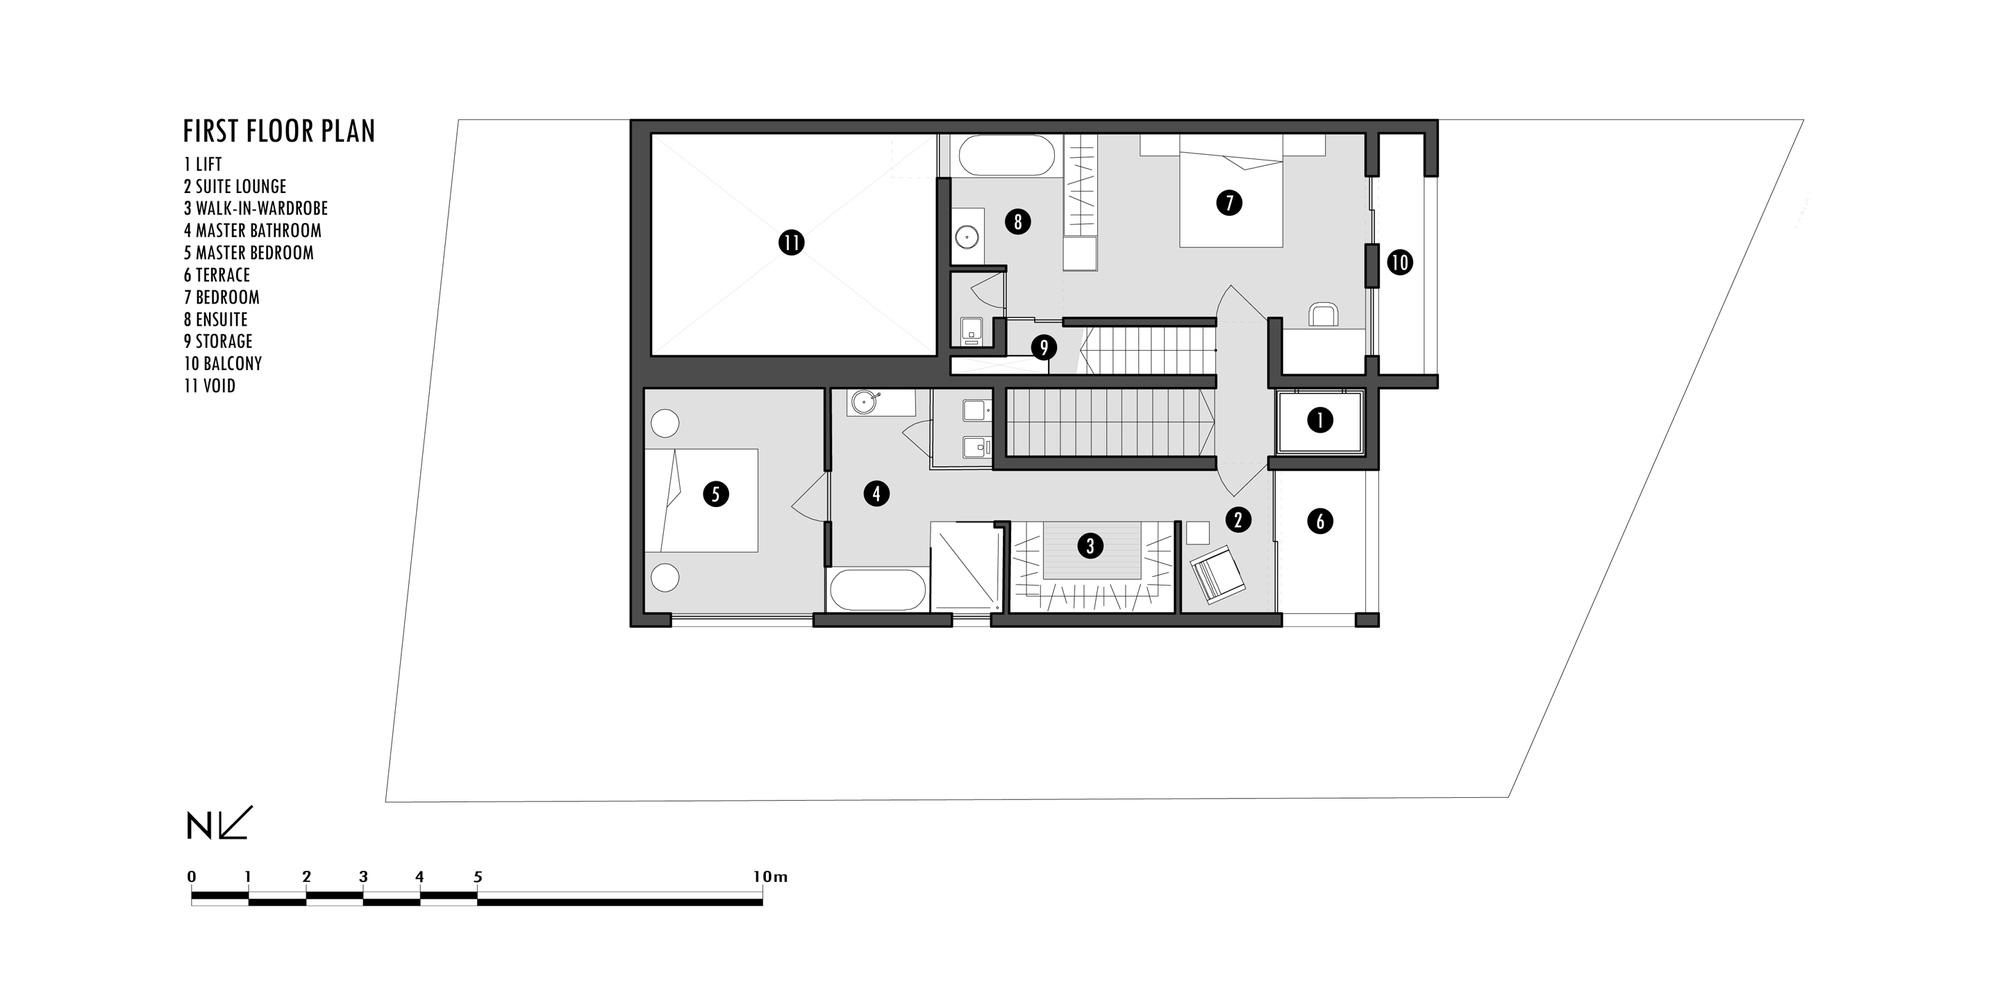 First Floor Plan, Hanging Home in Naxxar, Malta by Chris Briffa Architects